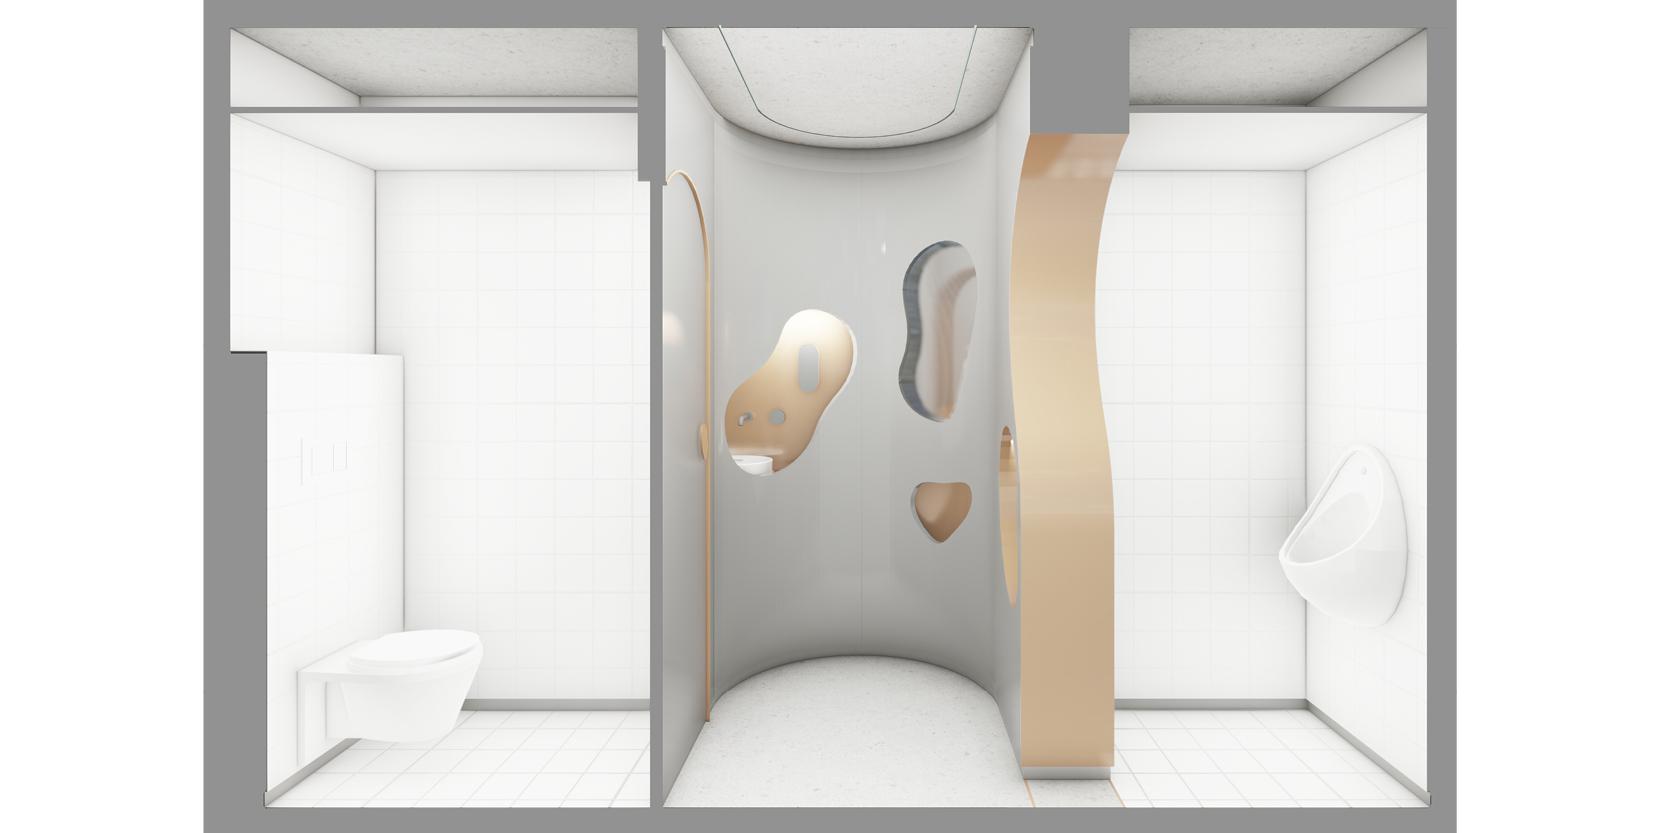 Reforma lavabos estadistica IDESCAT OCA Architects Arquitectura architecture interior design disseny interior Hernan Lleida Bernardo Garcia3